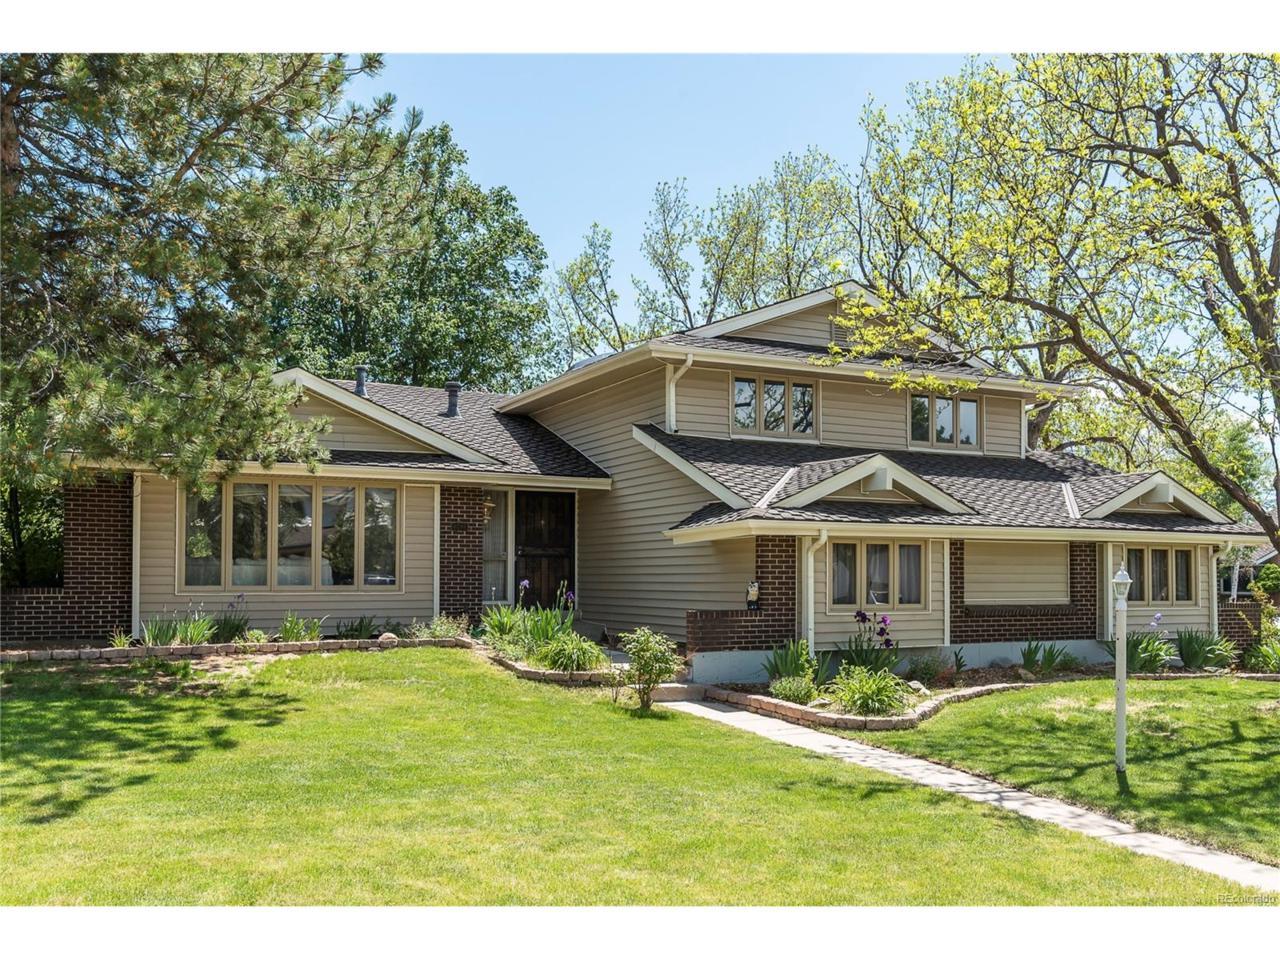 6296 S Hudson Court, Centennial, CO 80121 (MLS #8091565) :: 8z Real Estate